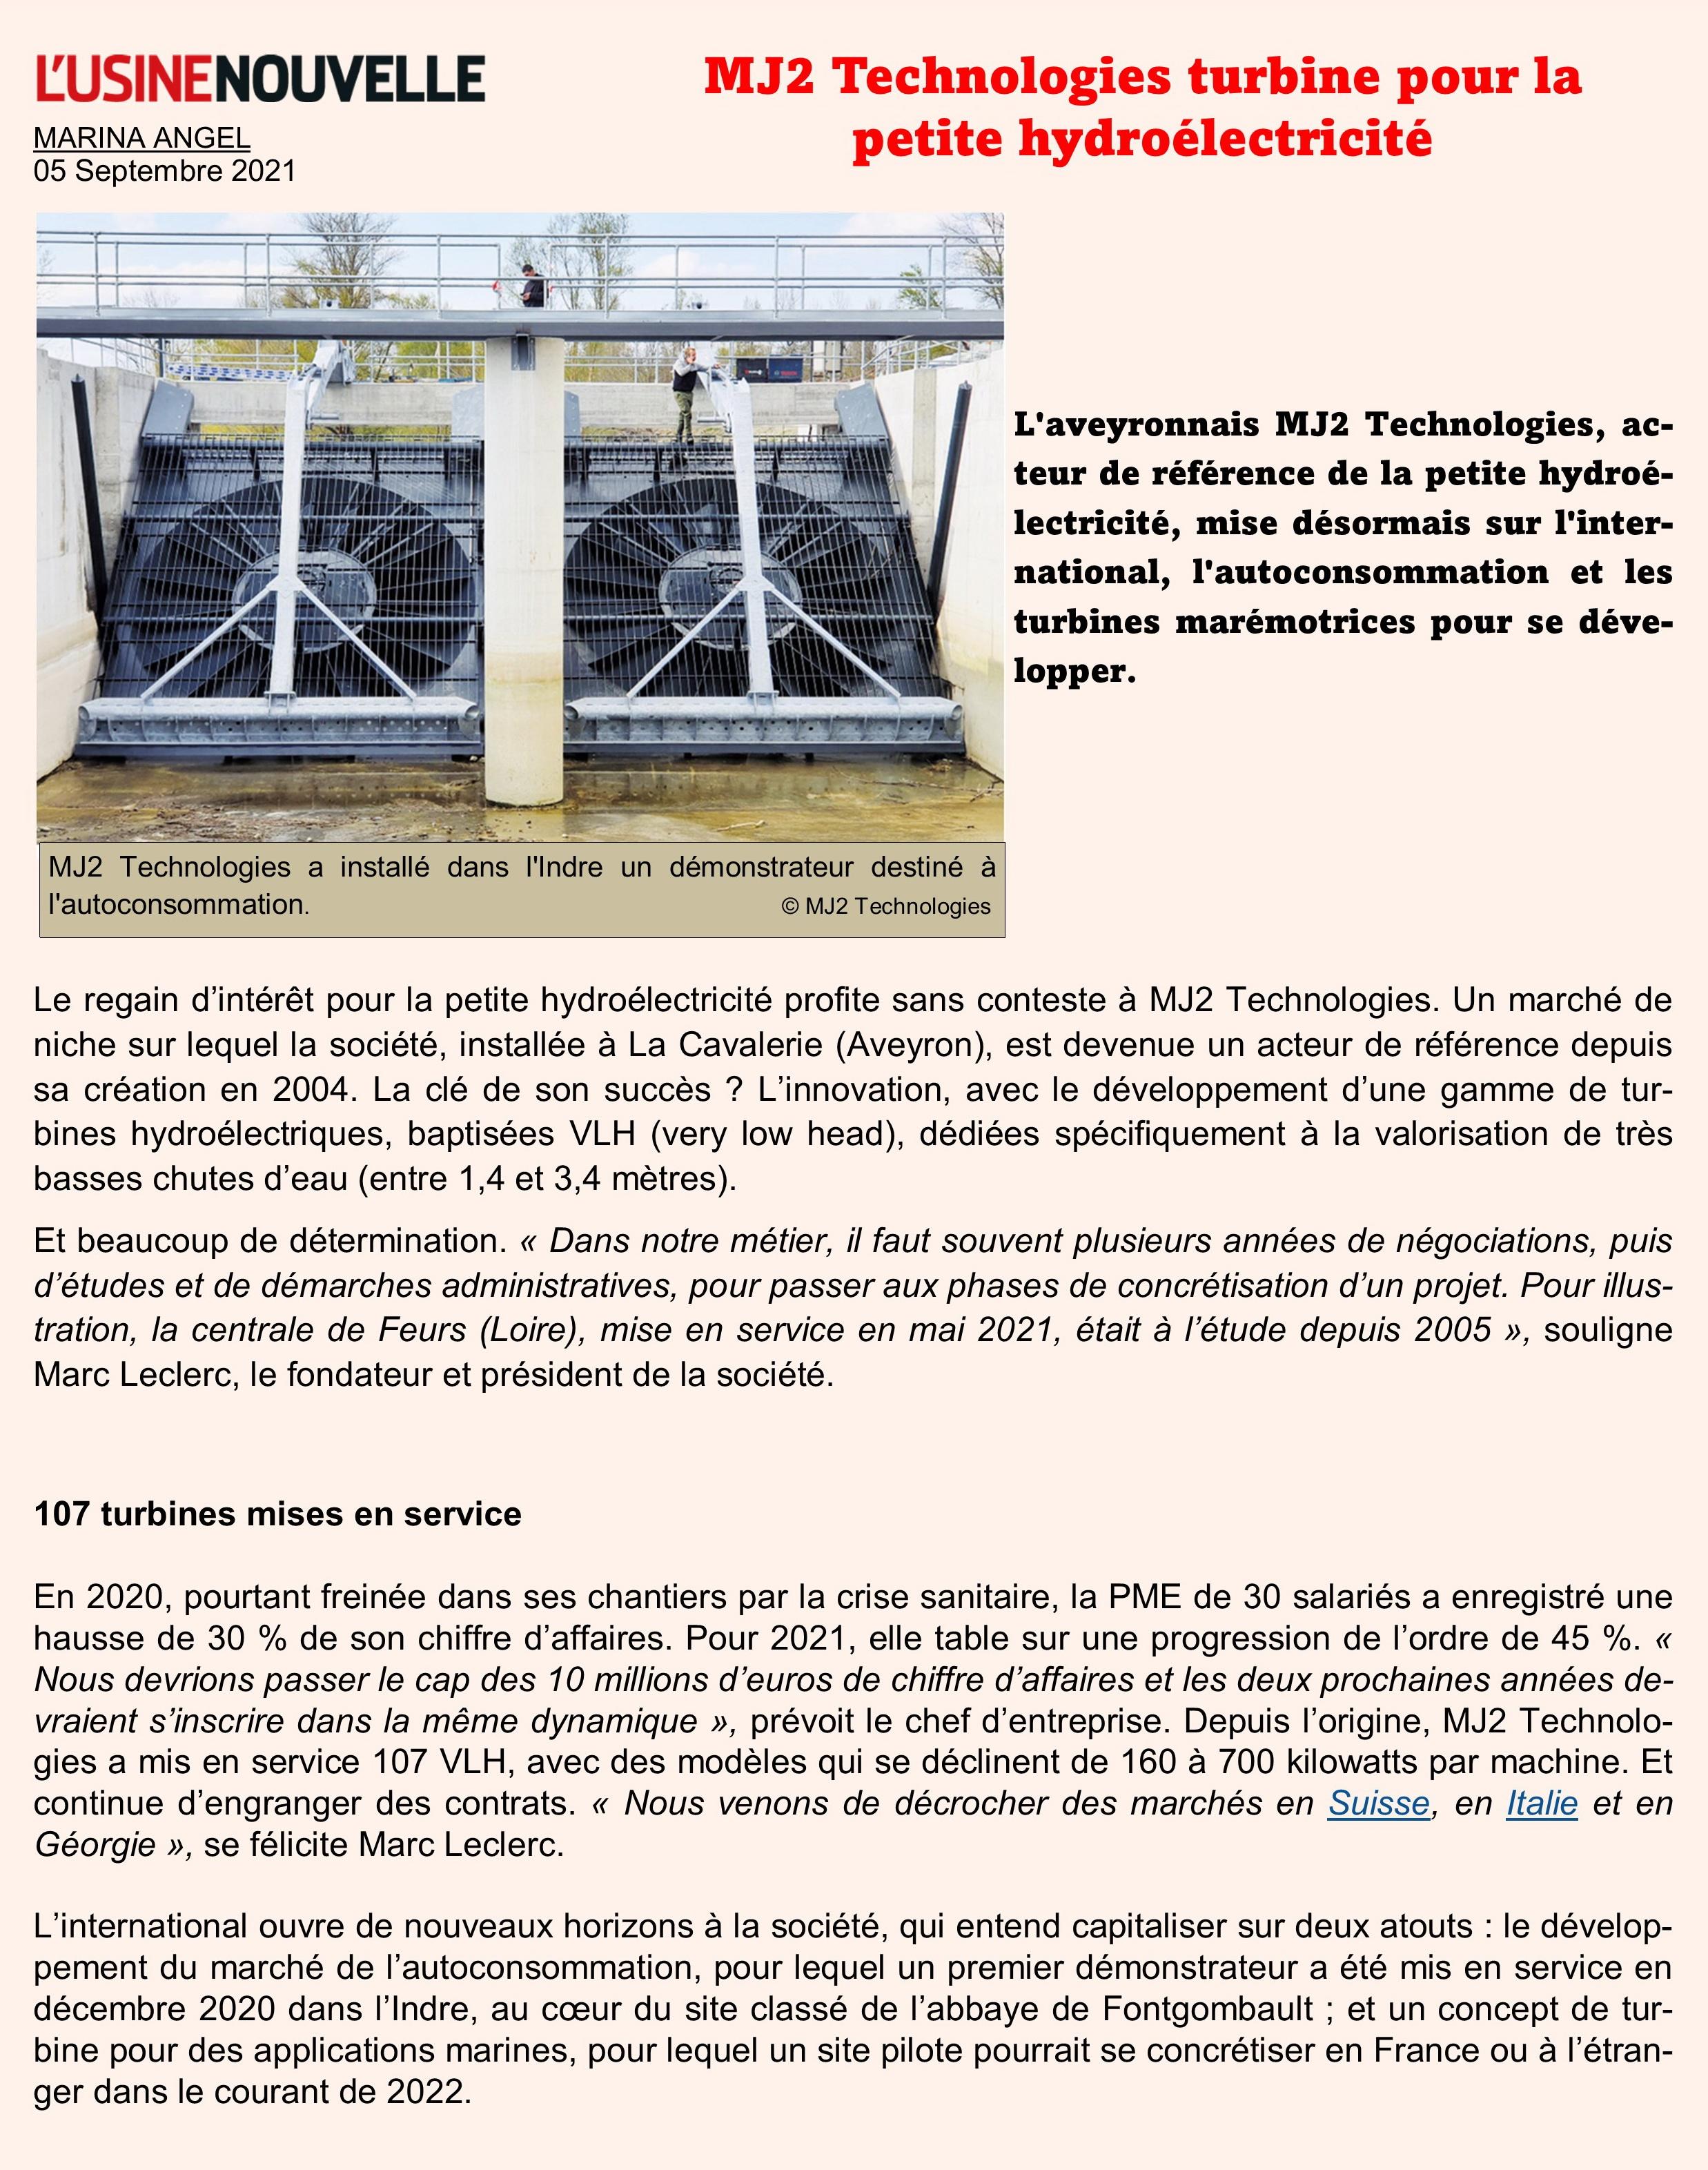 MJ2 turbine pour la petite hydro - Usine nouvelle